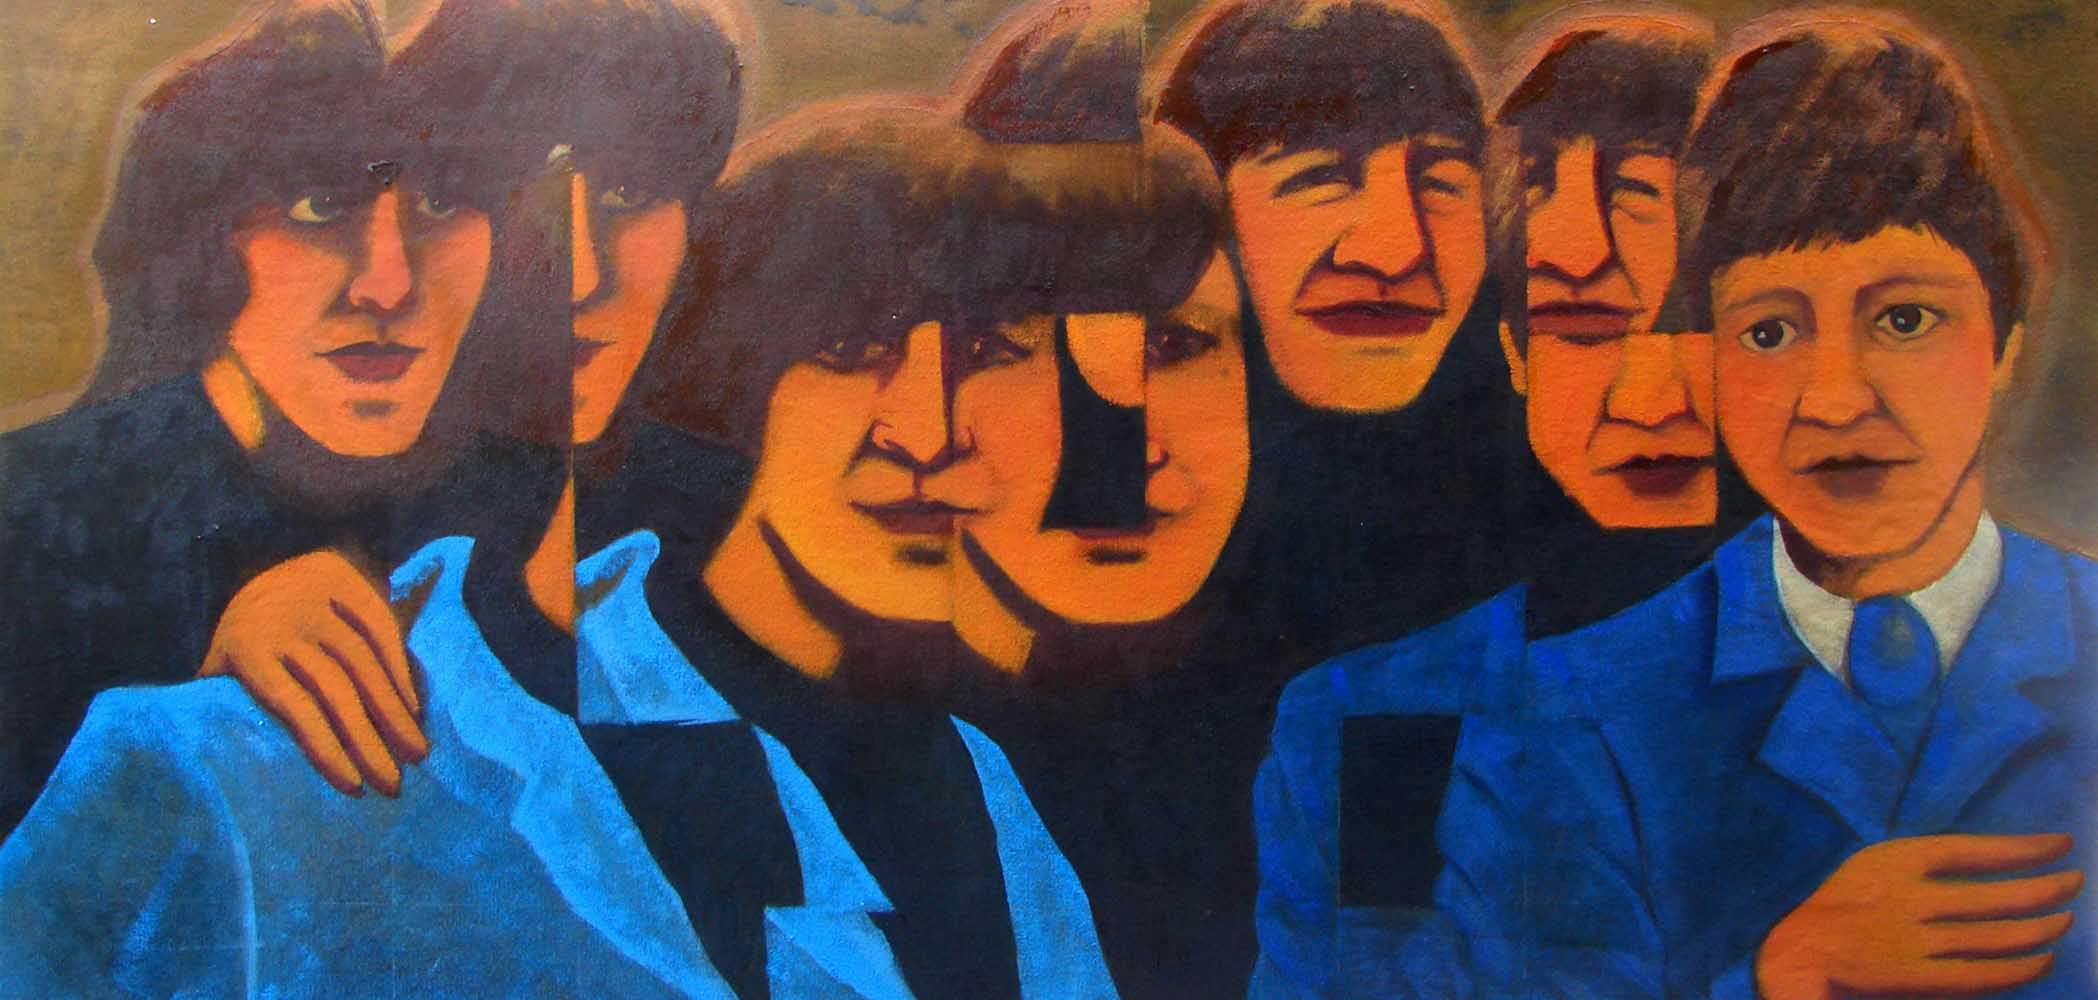 2015 Fragmentação The Beatles óleo s/lona 57x115cm